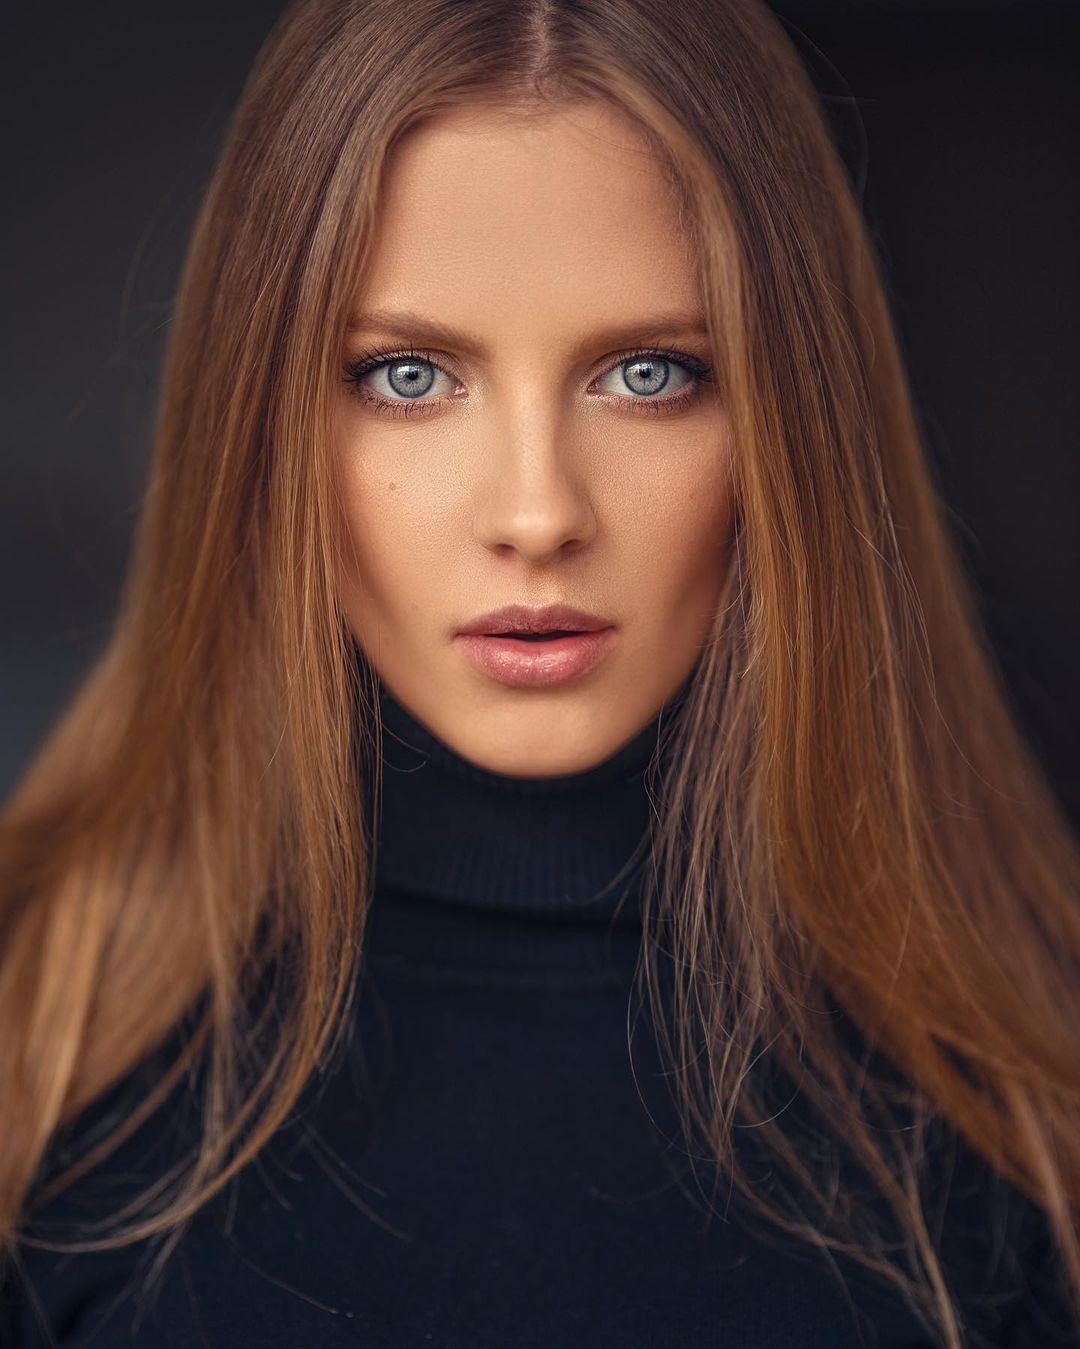 Nicole-marie-j-Wallpapers-Insta-Fit-Bio-17